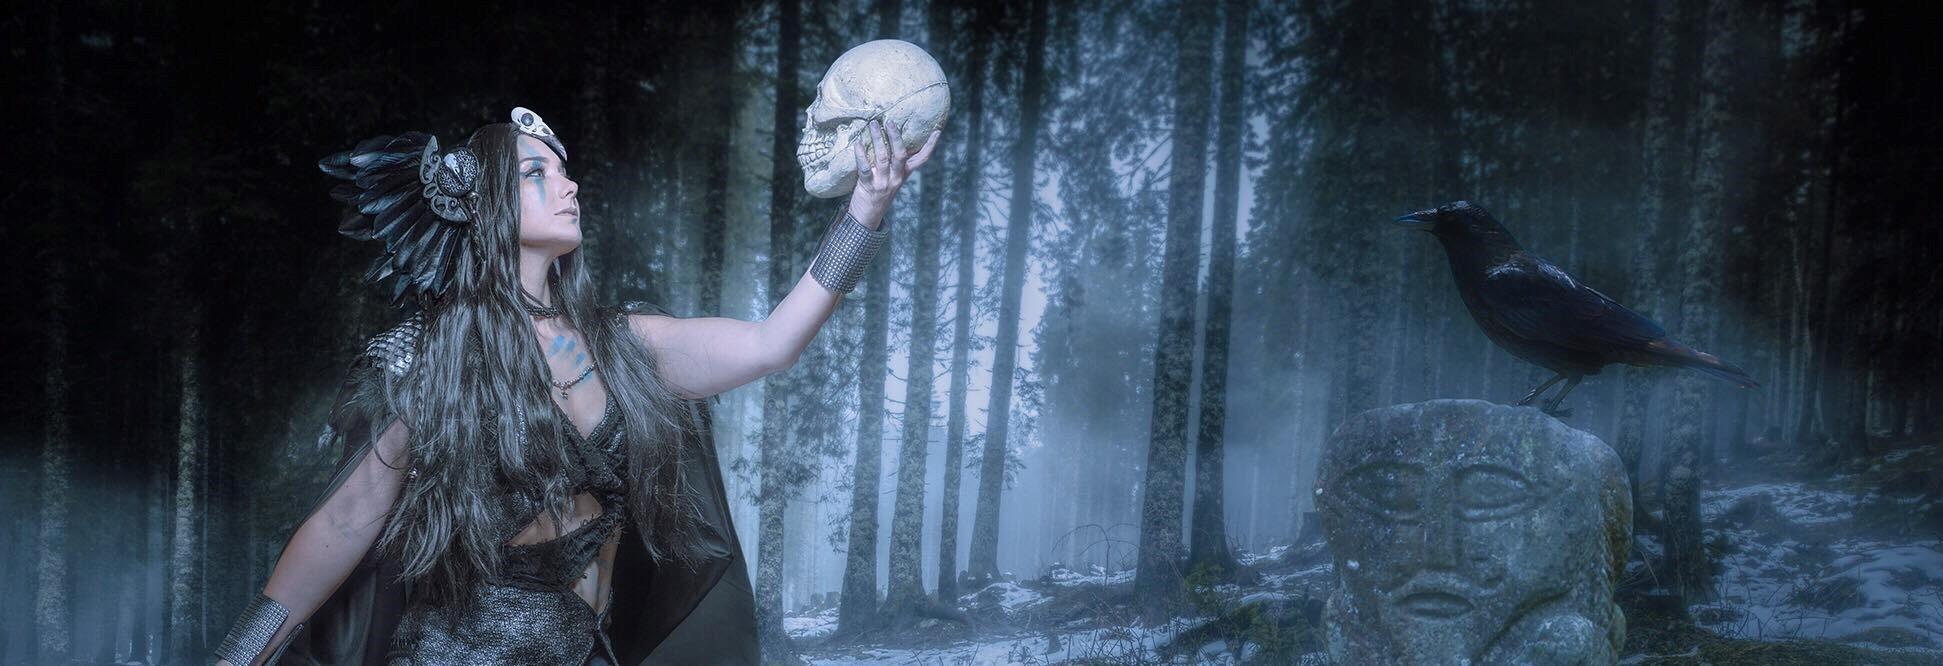 T (@neocryptica) Cover Image